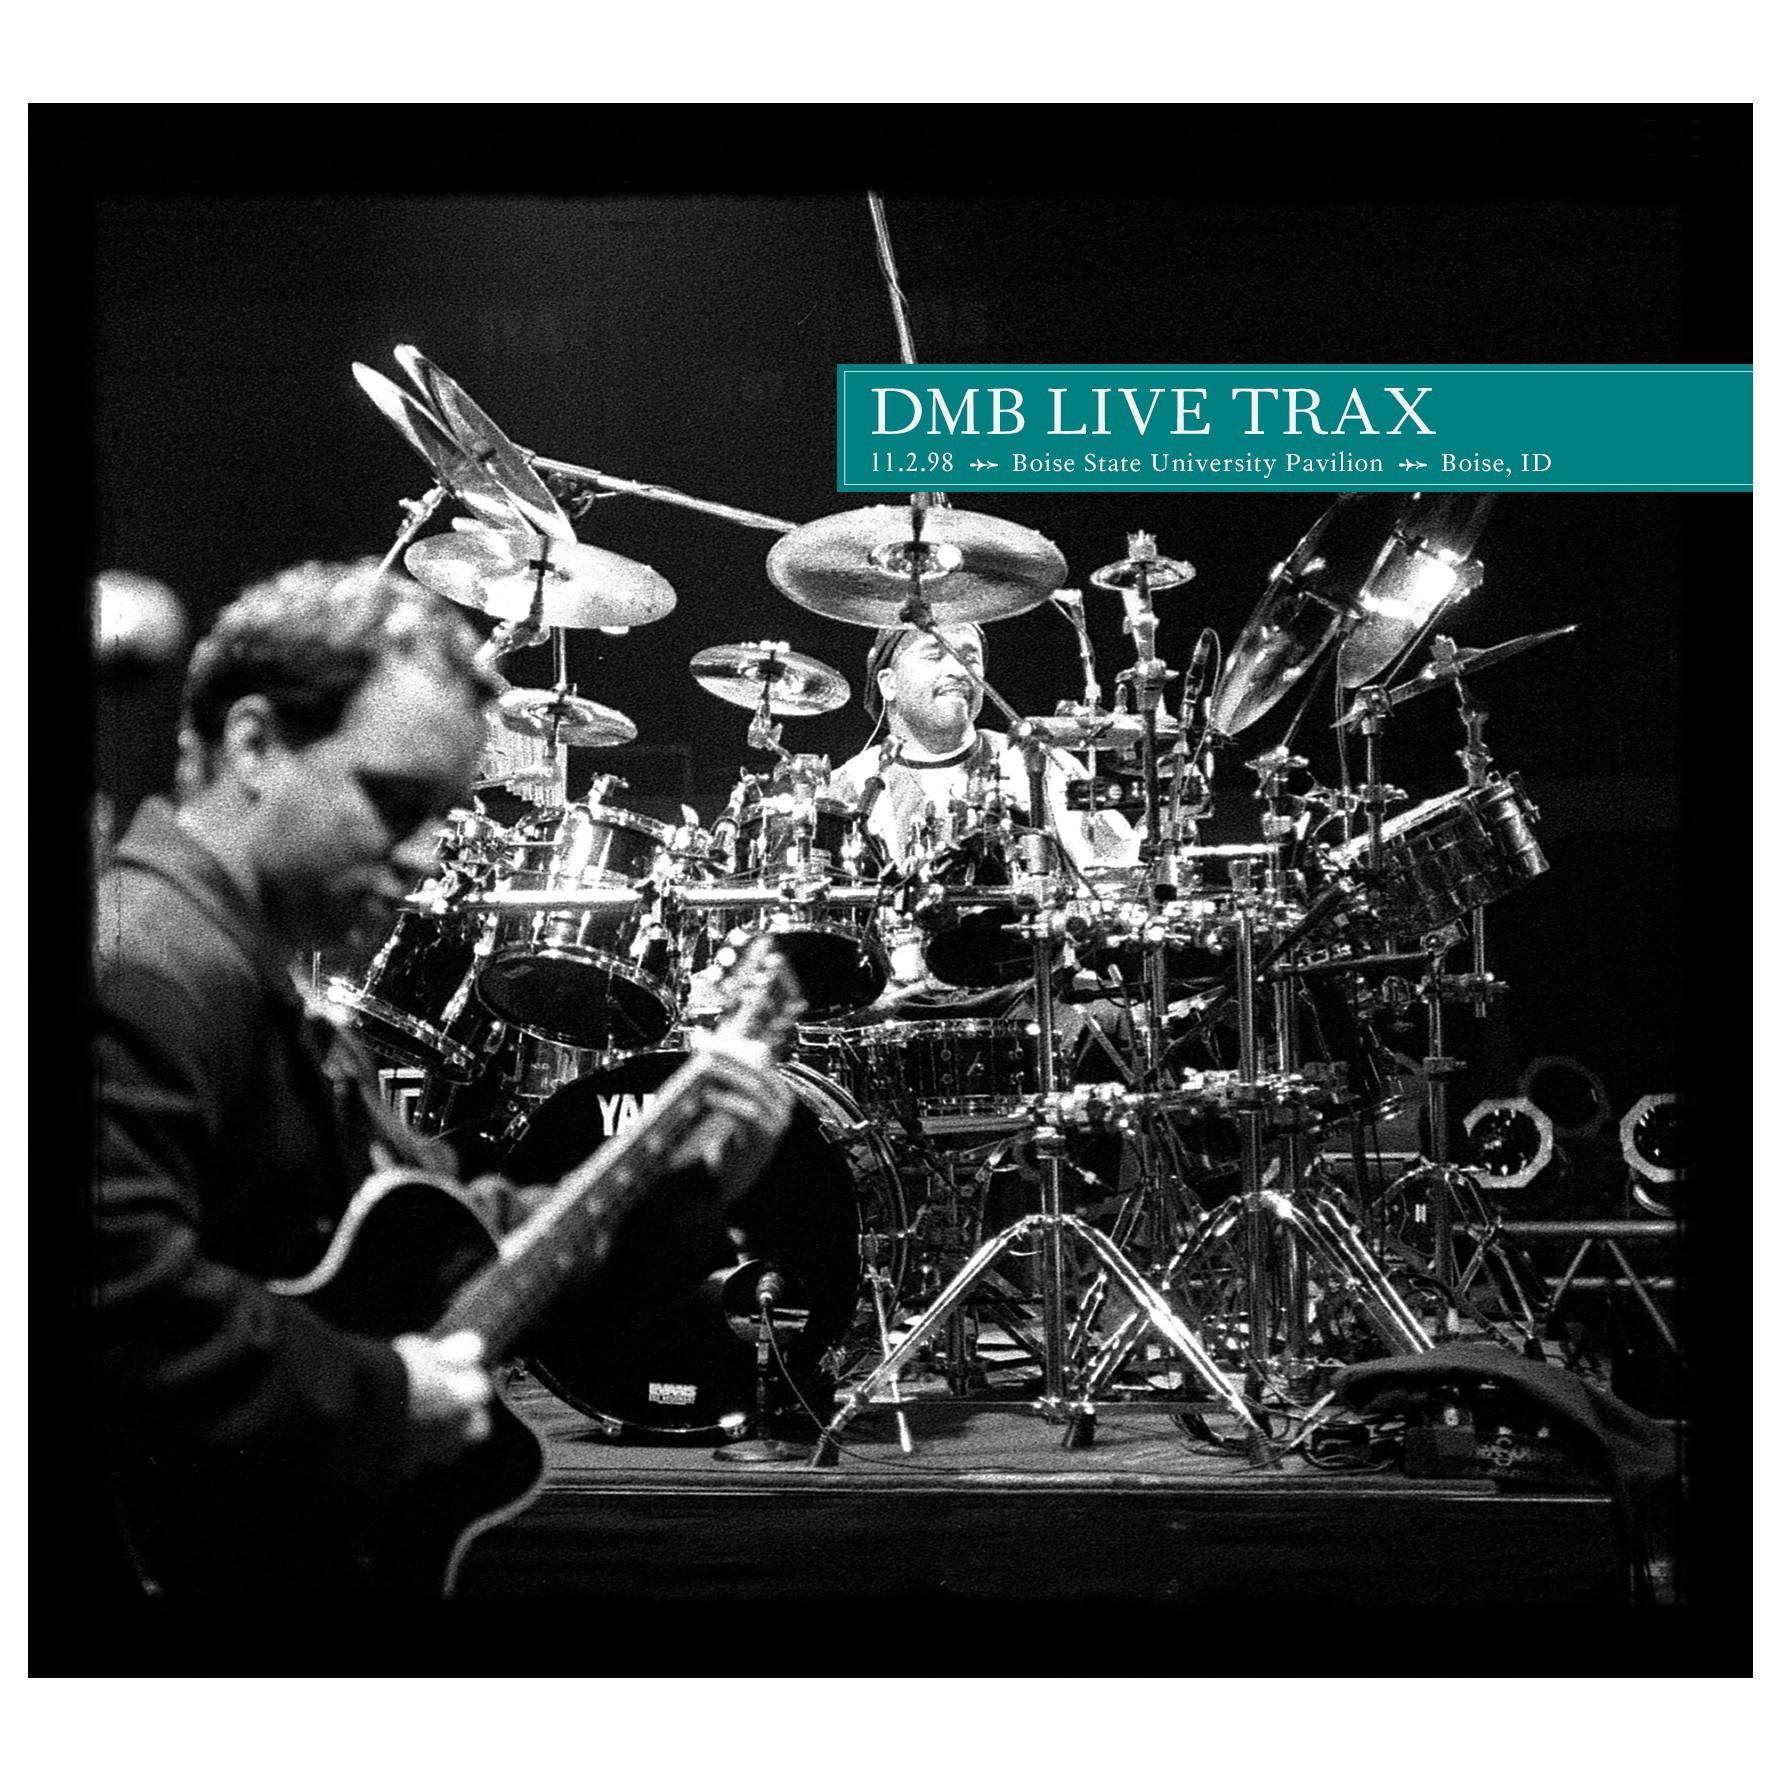 Live Trax vol. 53: Boise State University Pavilion